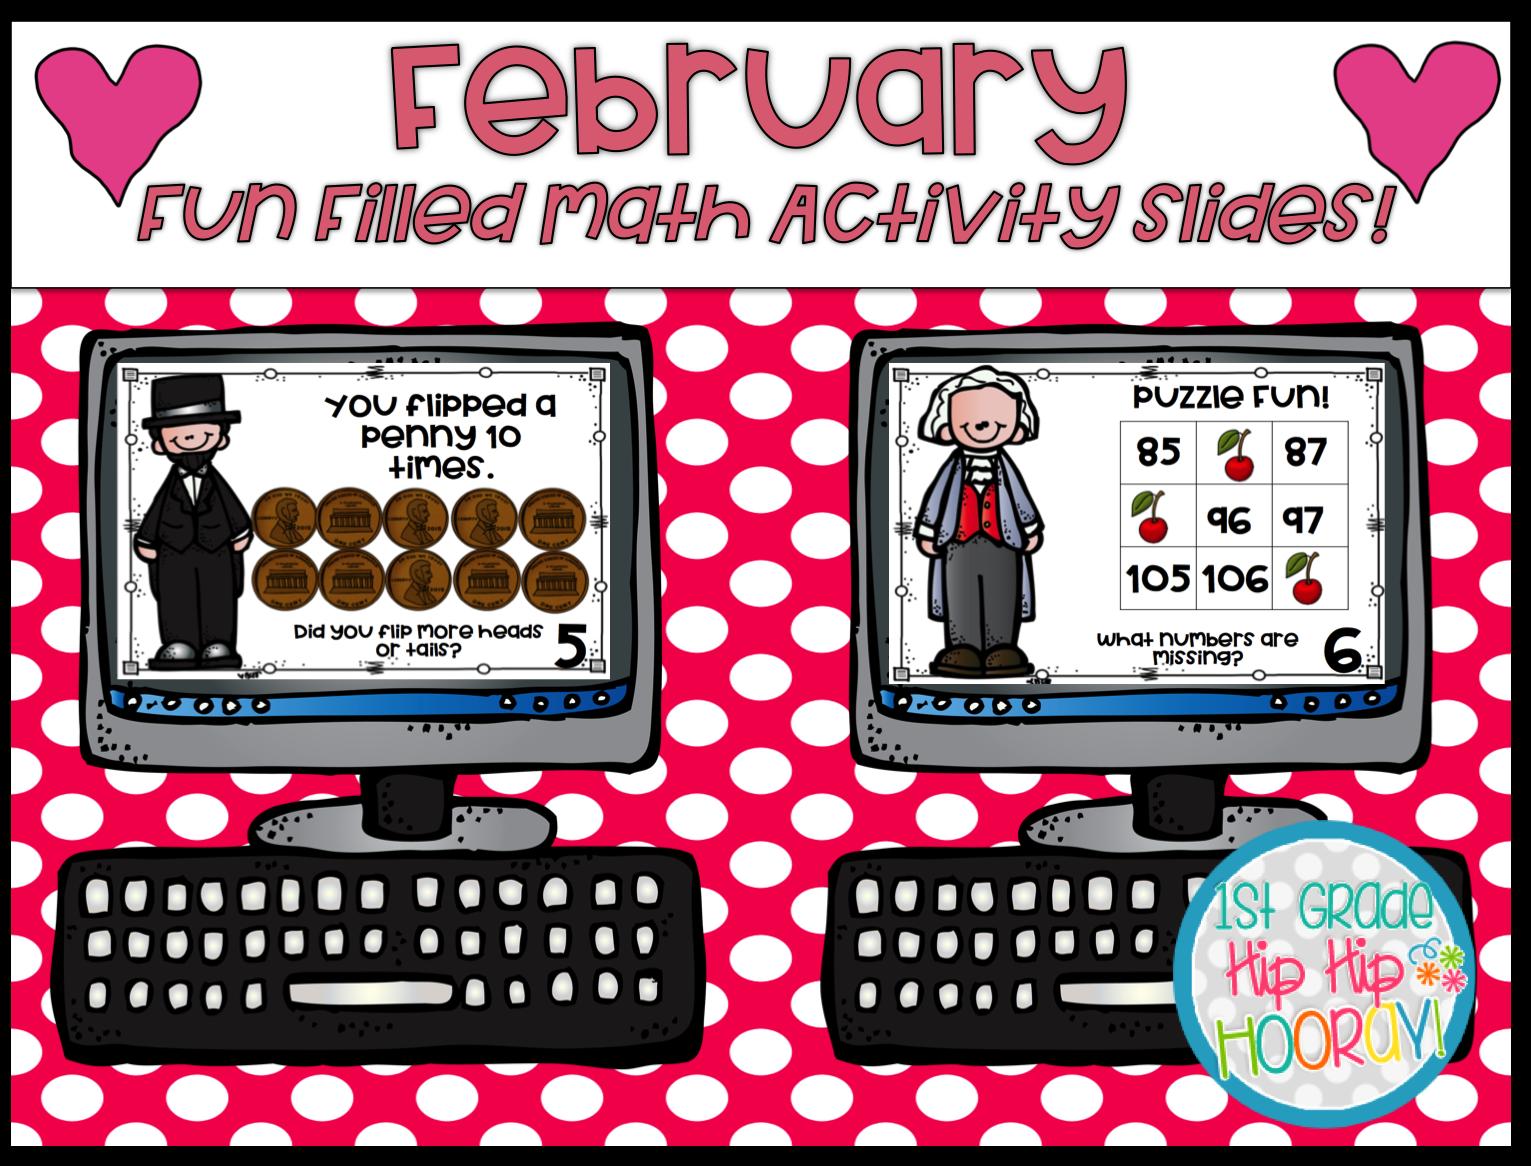 1st Grade Hip Hip Hooray February Fun Filled Math